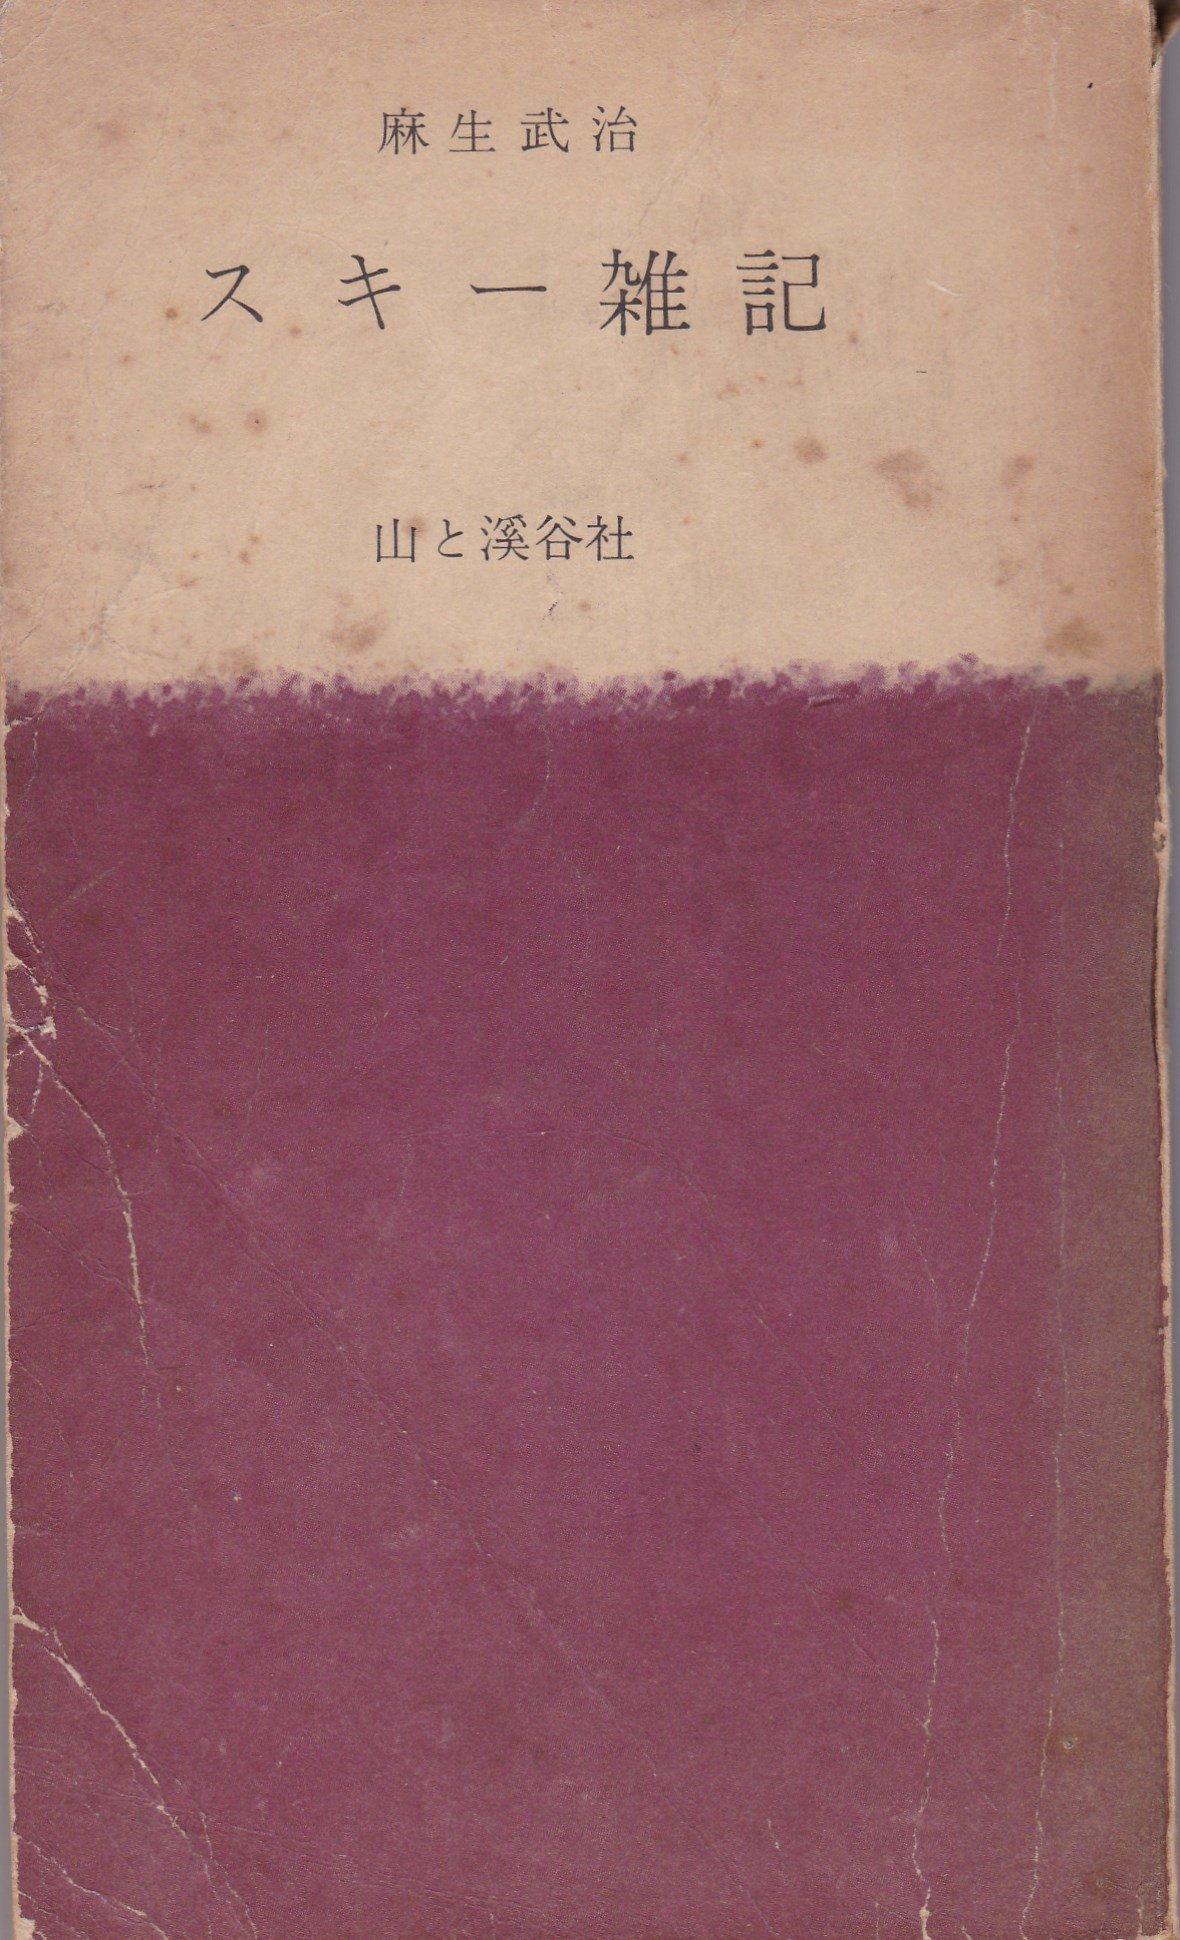 スキー雑記 (1955年) (山渓山岳...